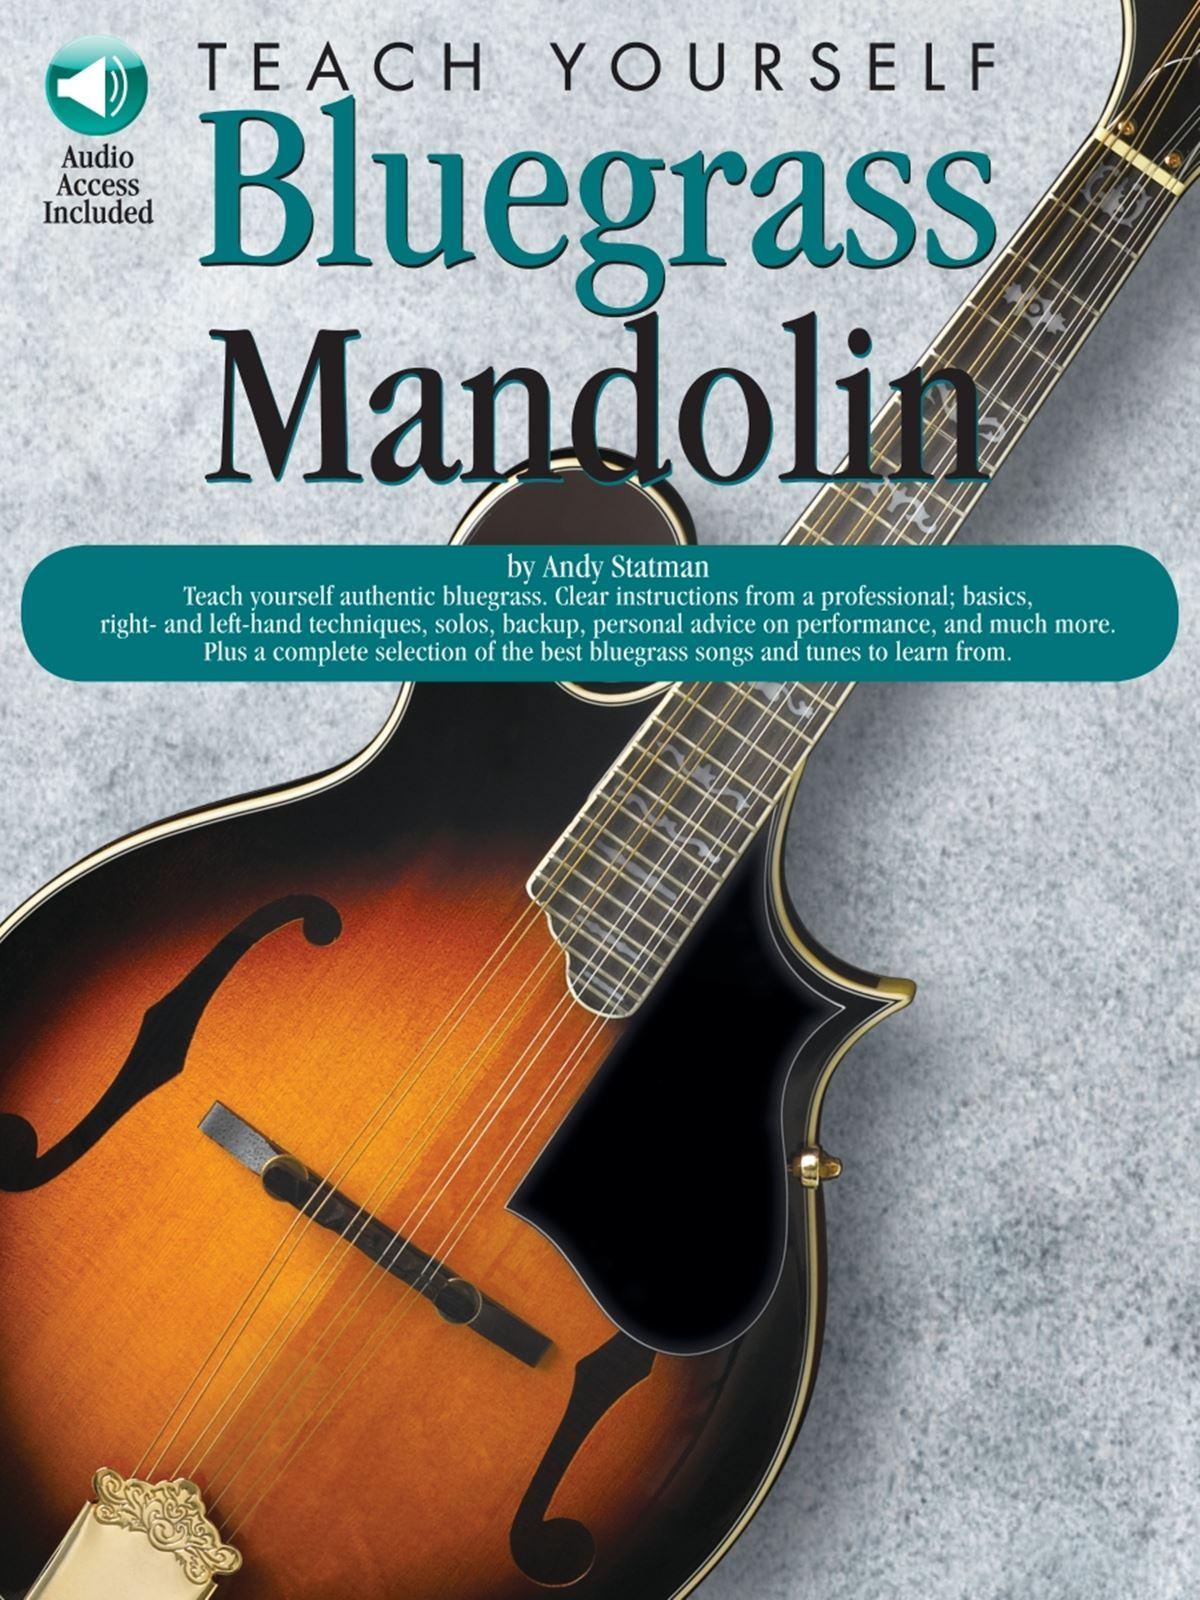 Teach Yourself Bluegrass Mandolin: Mandolin: Instrumental Tutor